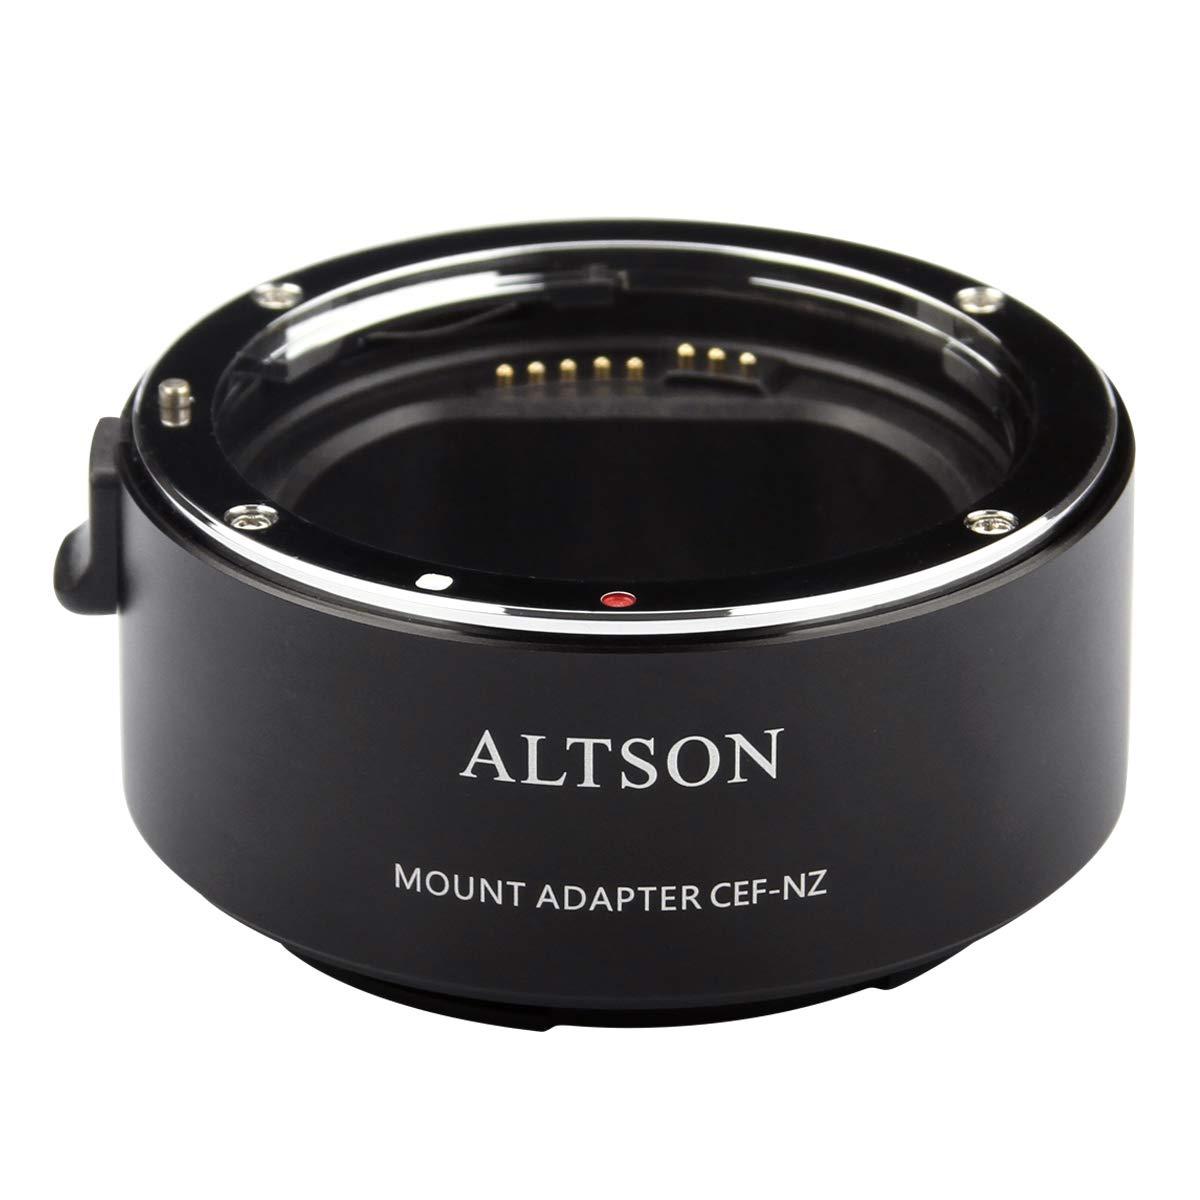 Altson CEF-NZ Smart Adaptor is Compatible with Canon EF/EF-S Len to Nikon Z Mount Camera Z6 Z7 (CEF-NZ) by Altson